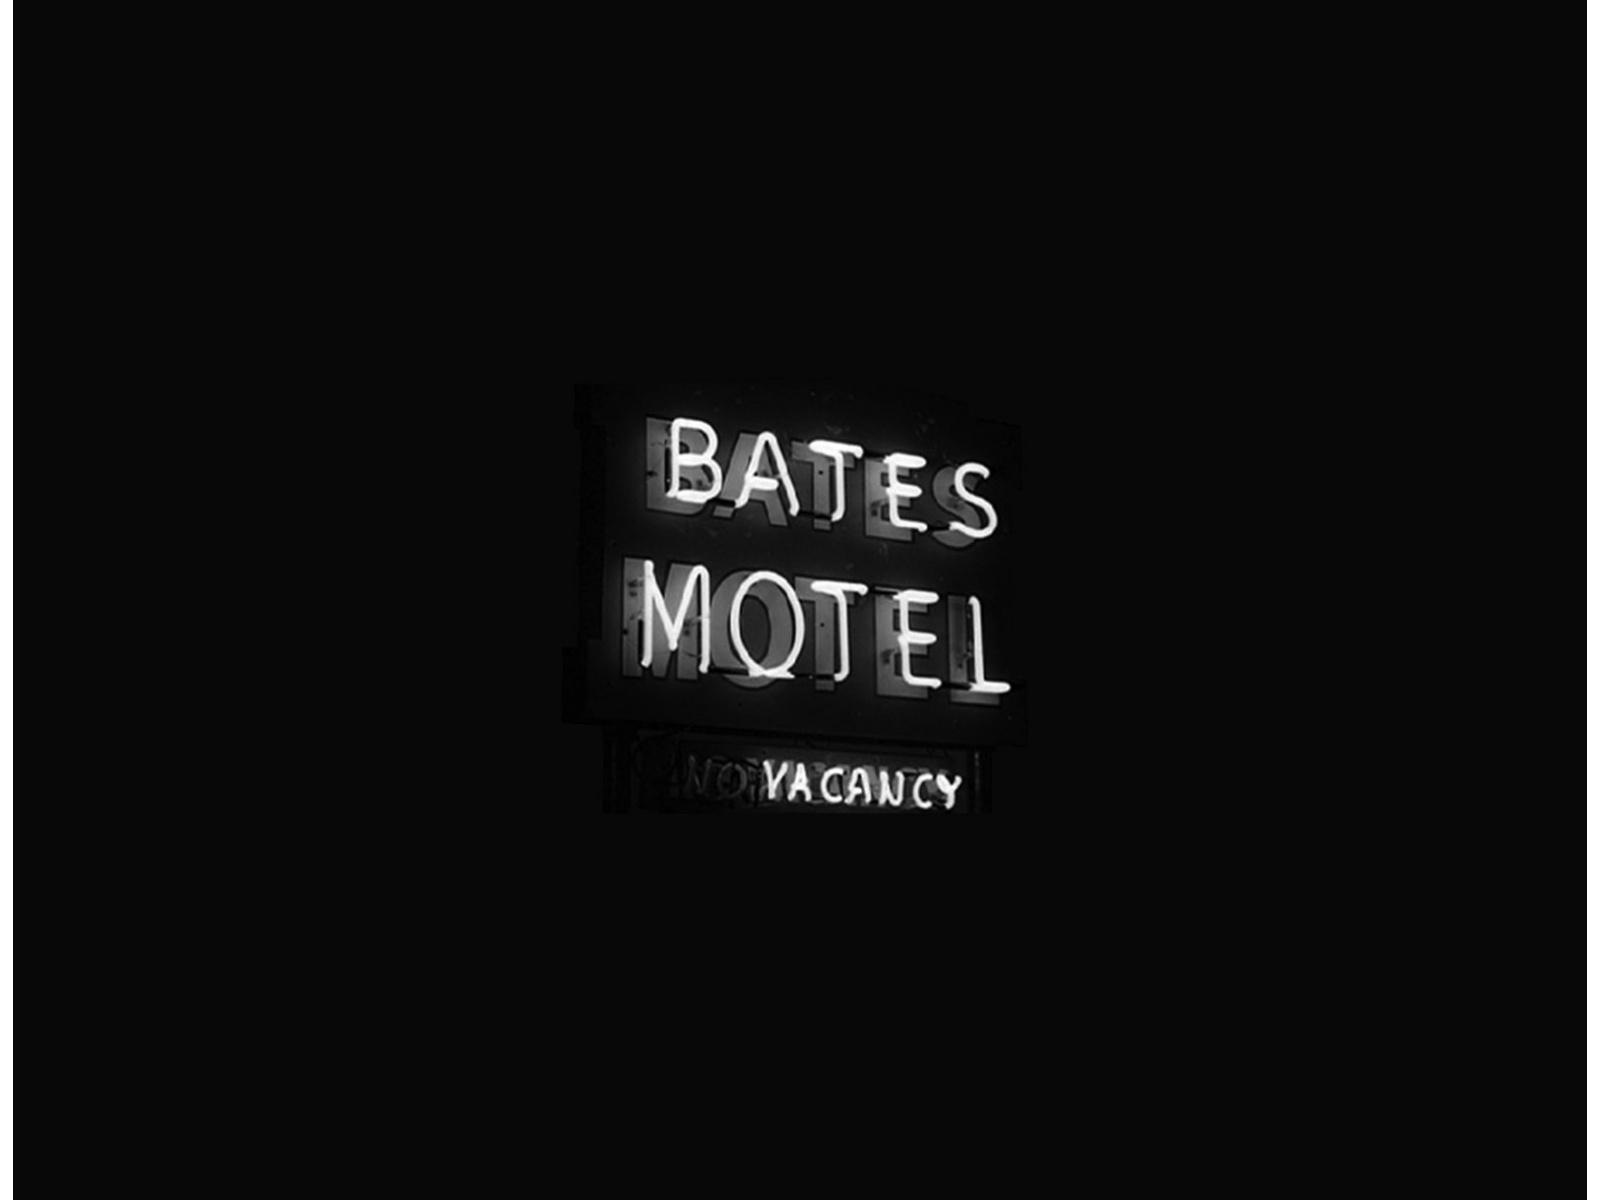 bates_motel_psycho_wallpaper-1600x1200